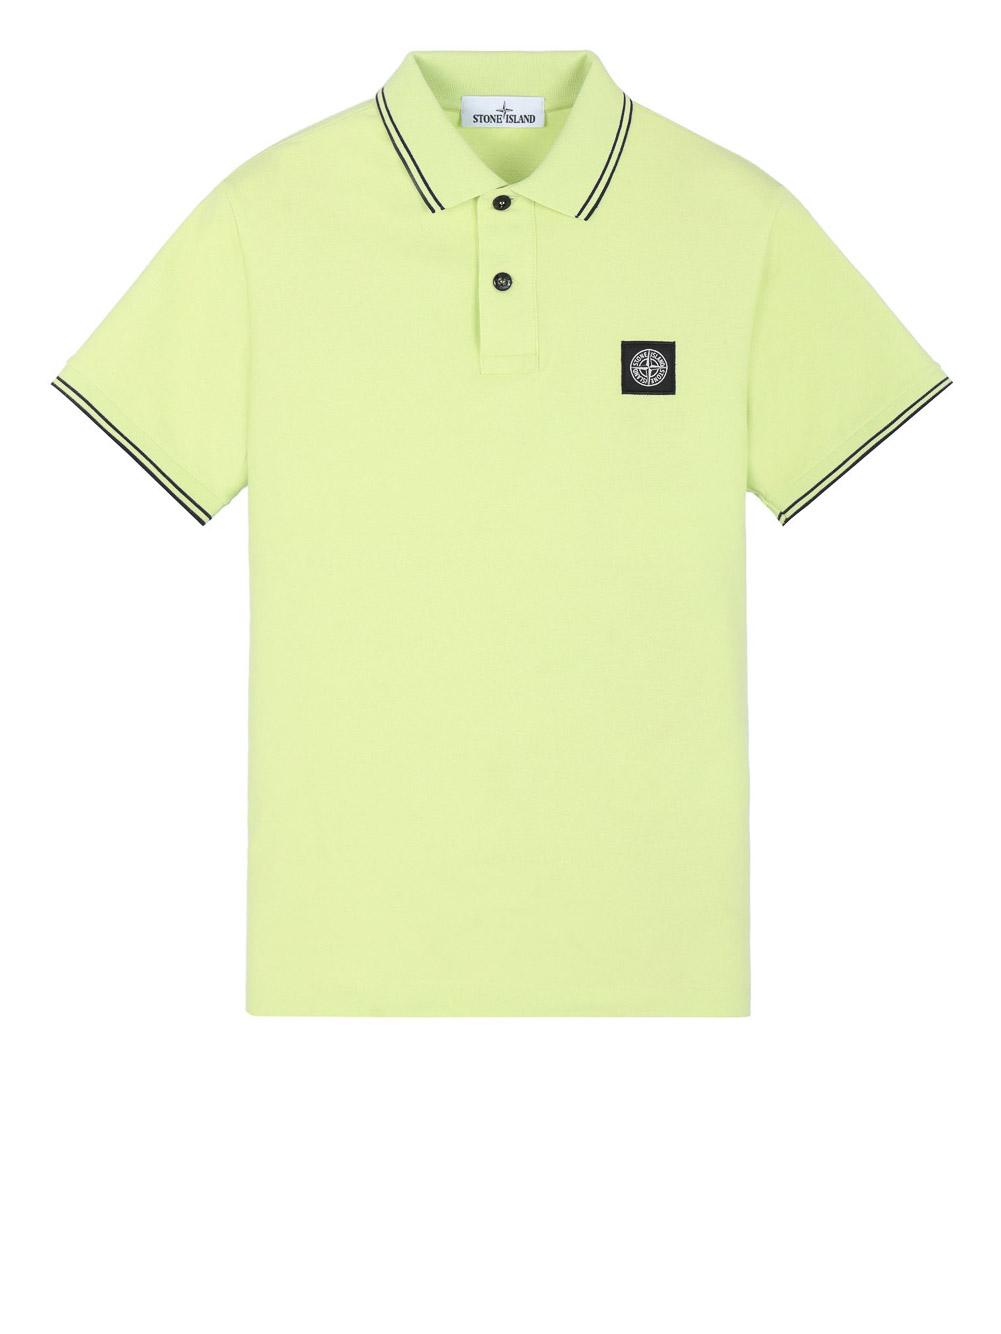 STONE ISLAND Μπλούζα Polo MO101522S18-V1031 ΚΙΤΡΙΝΟ